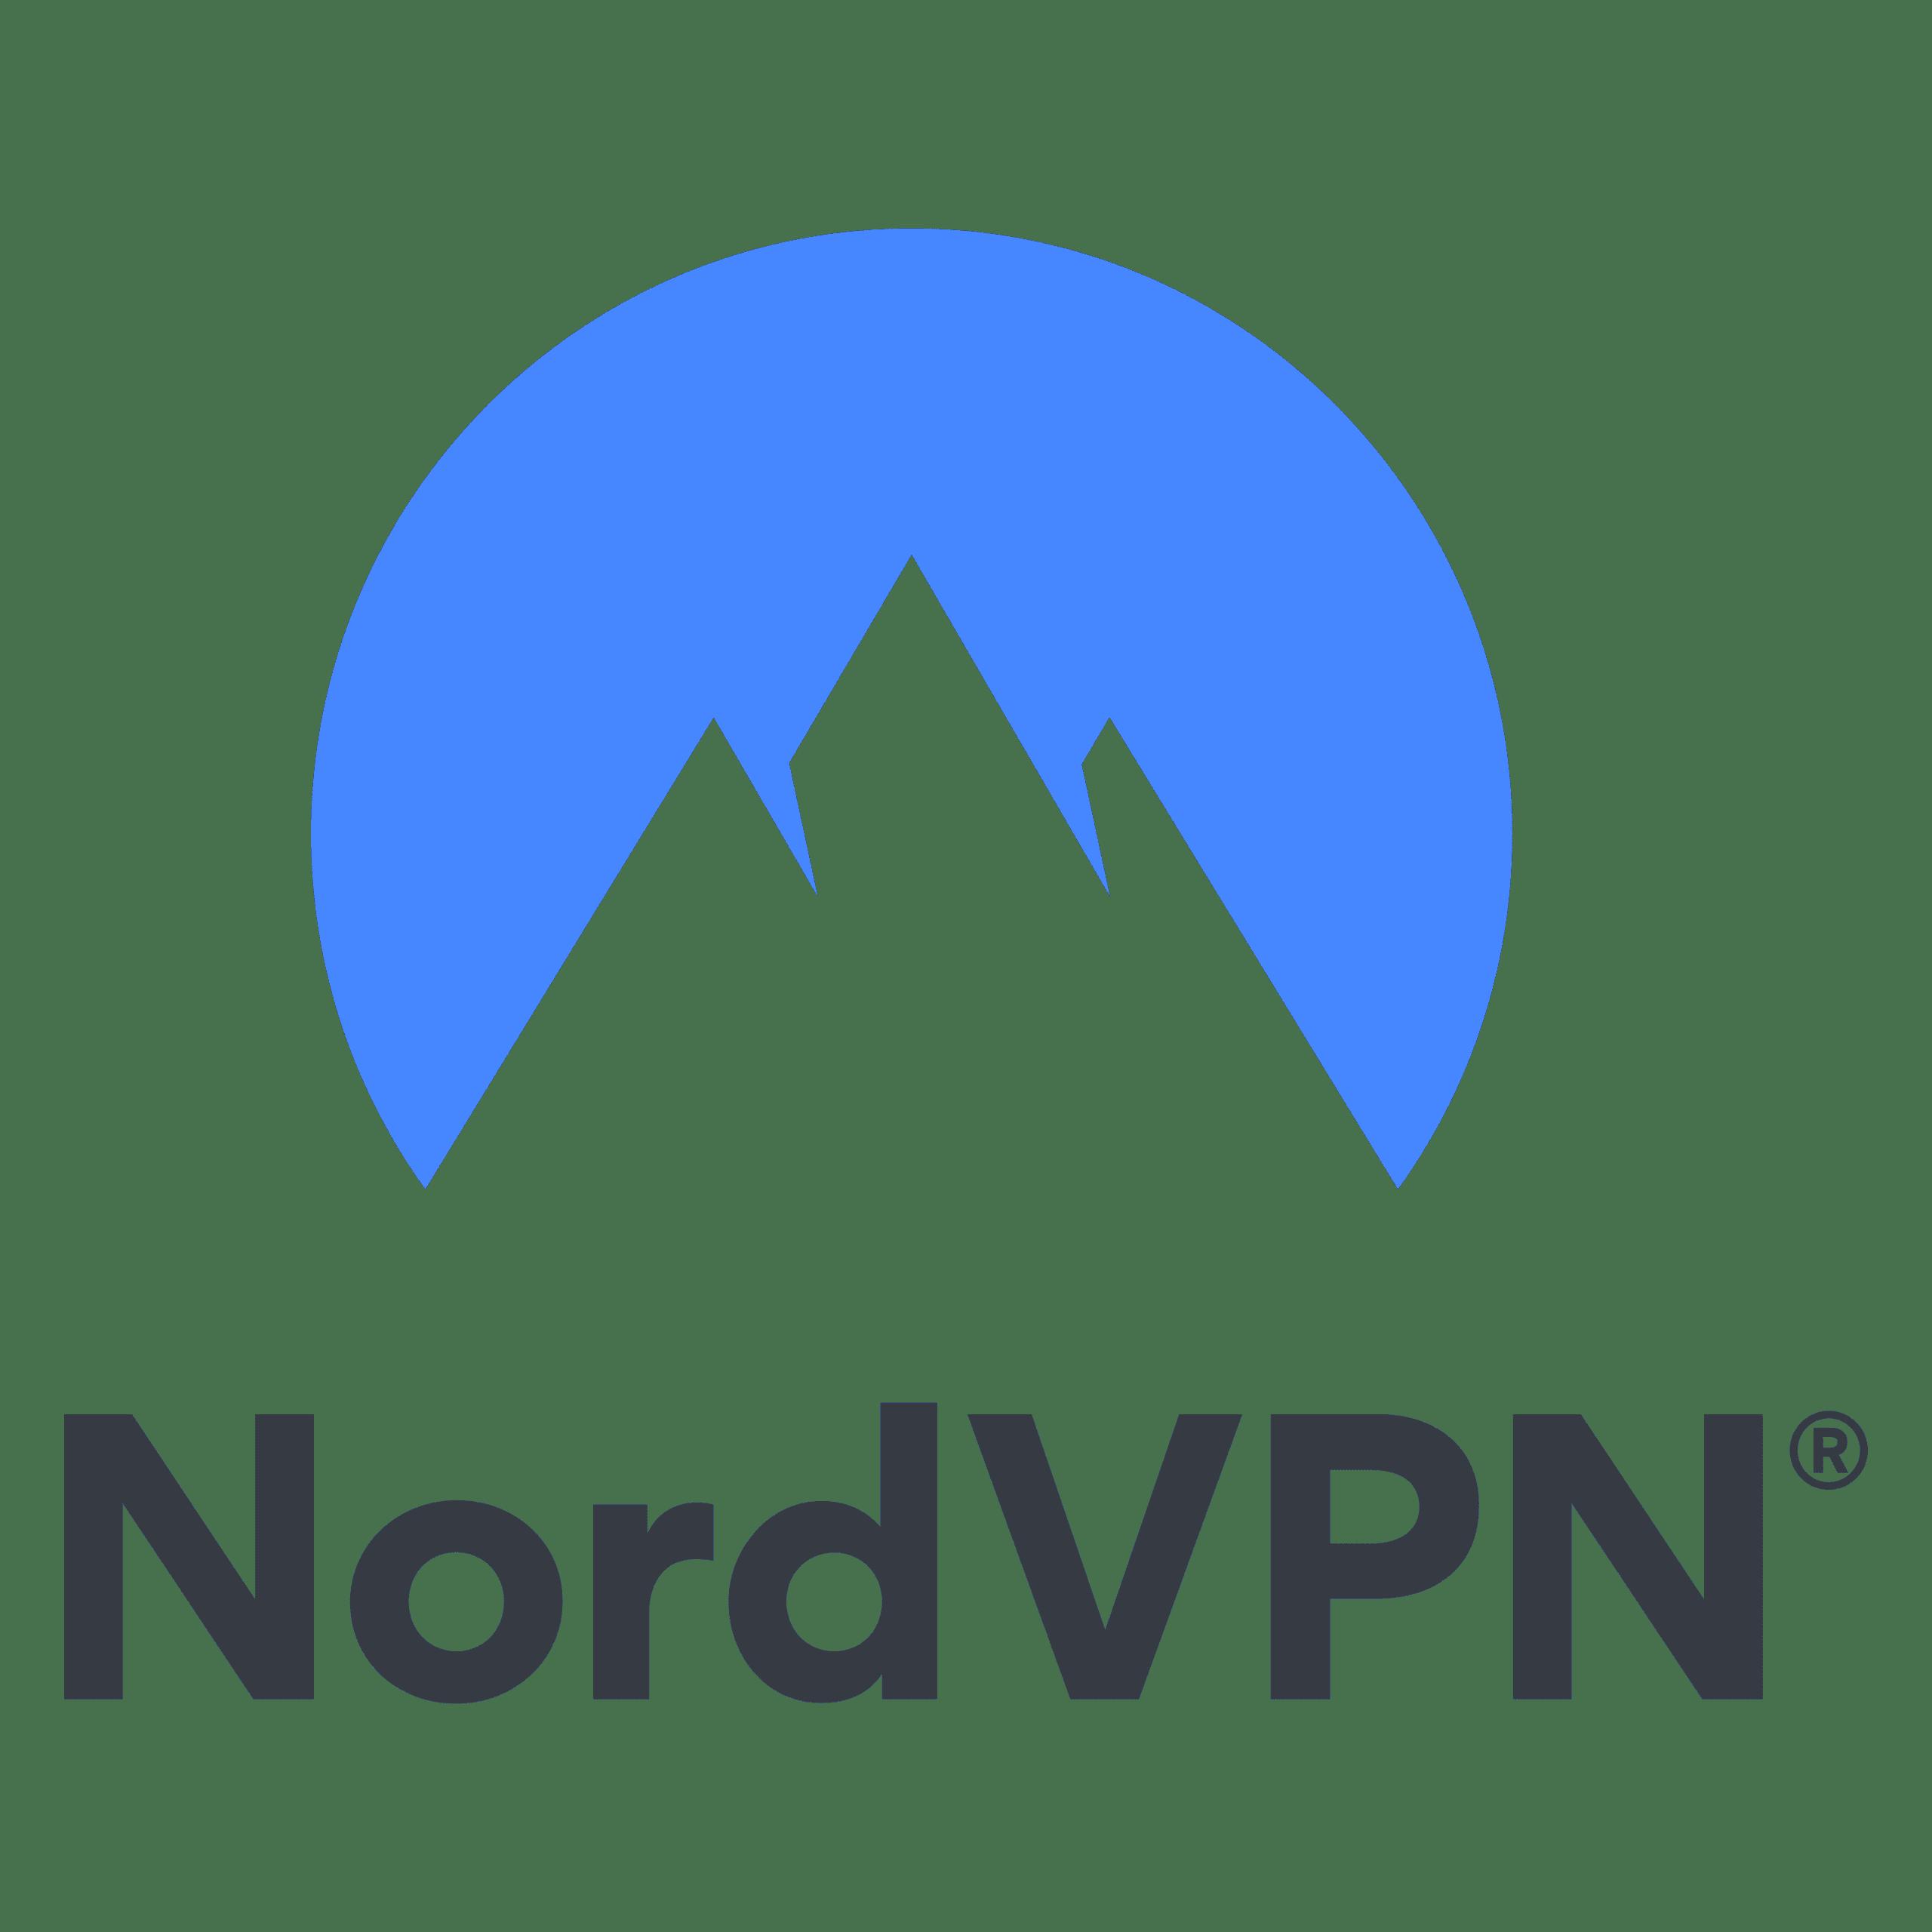 NordVPN - VPN Black Friday Deals